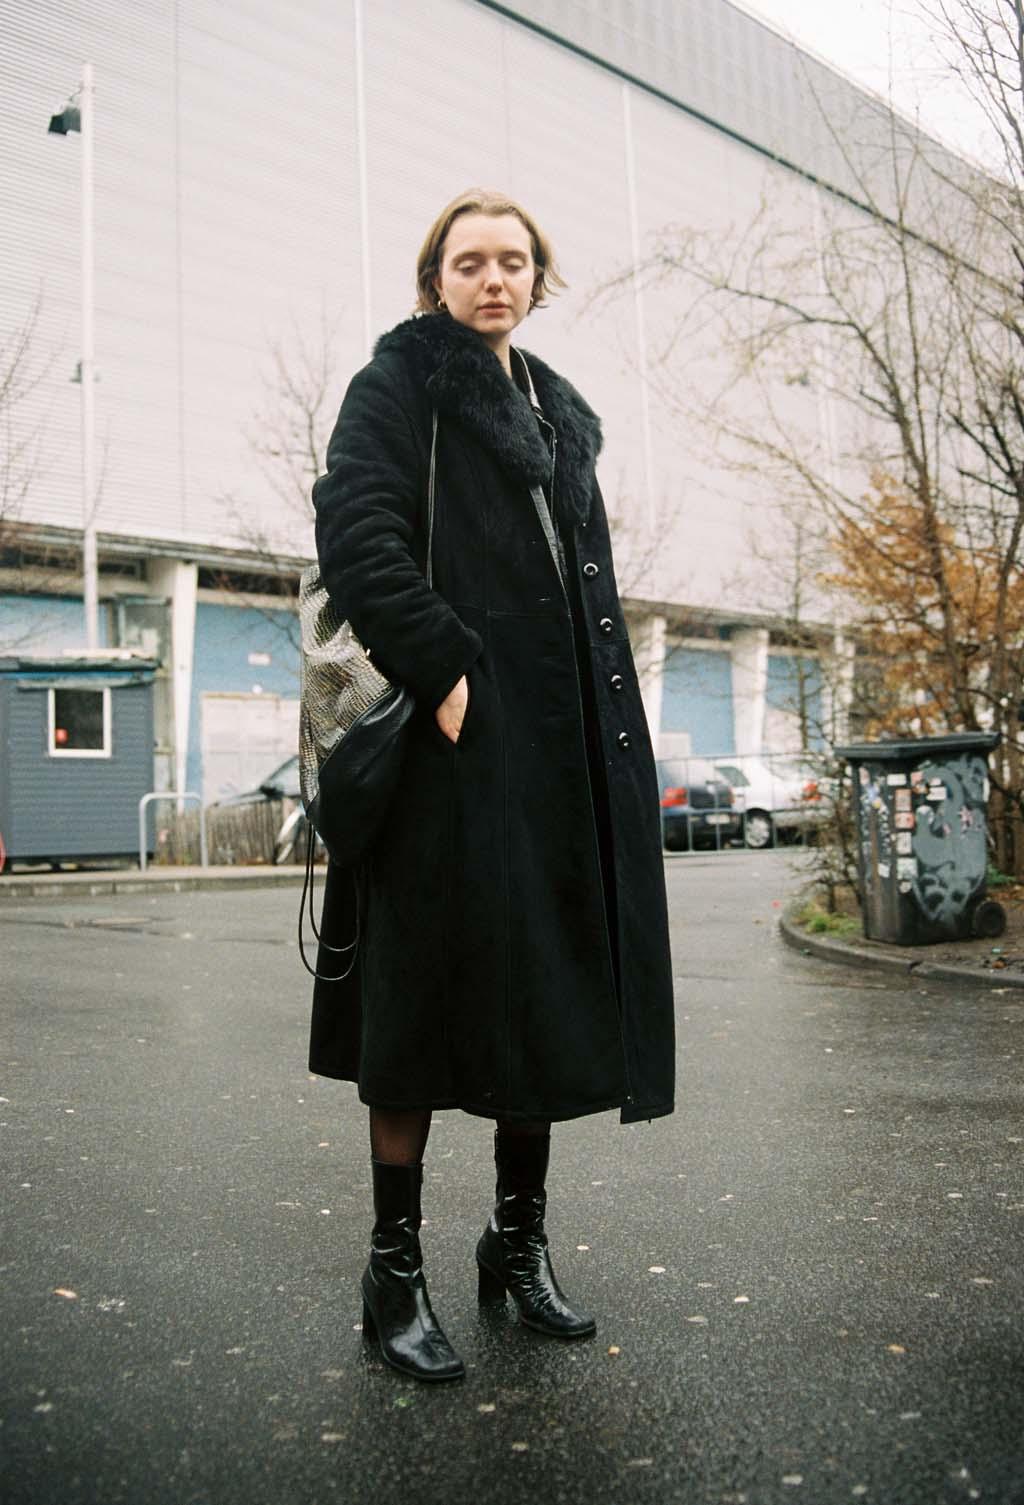 Nacht Clubs Berlin femme au long manteau noir